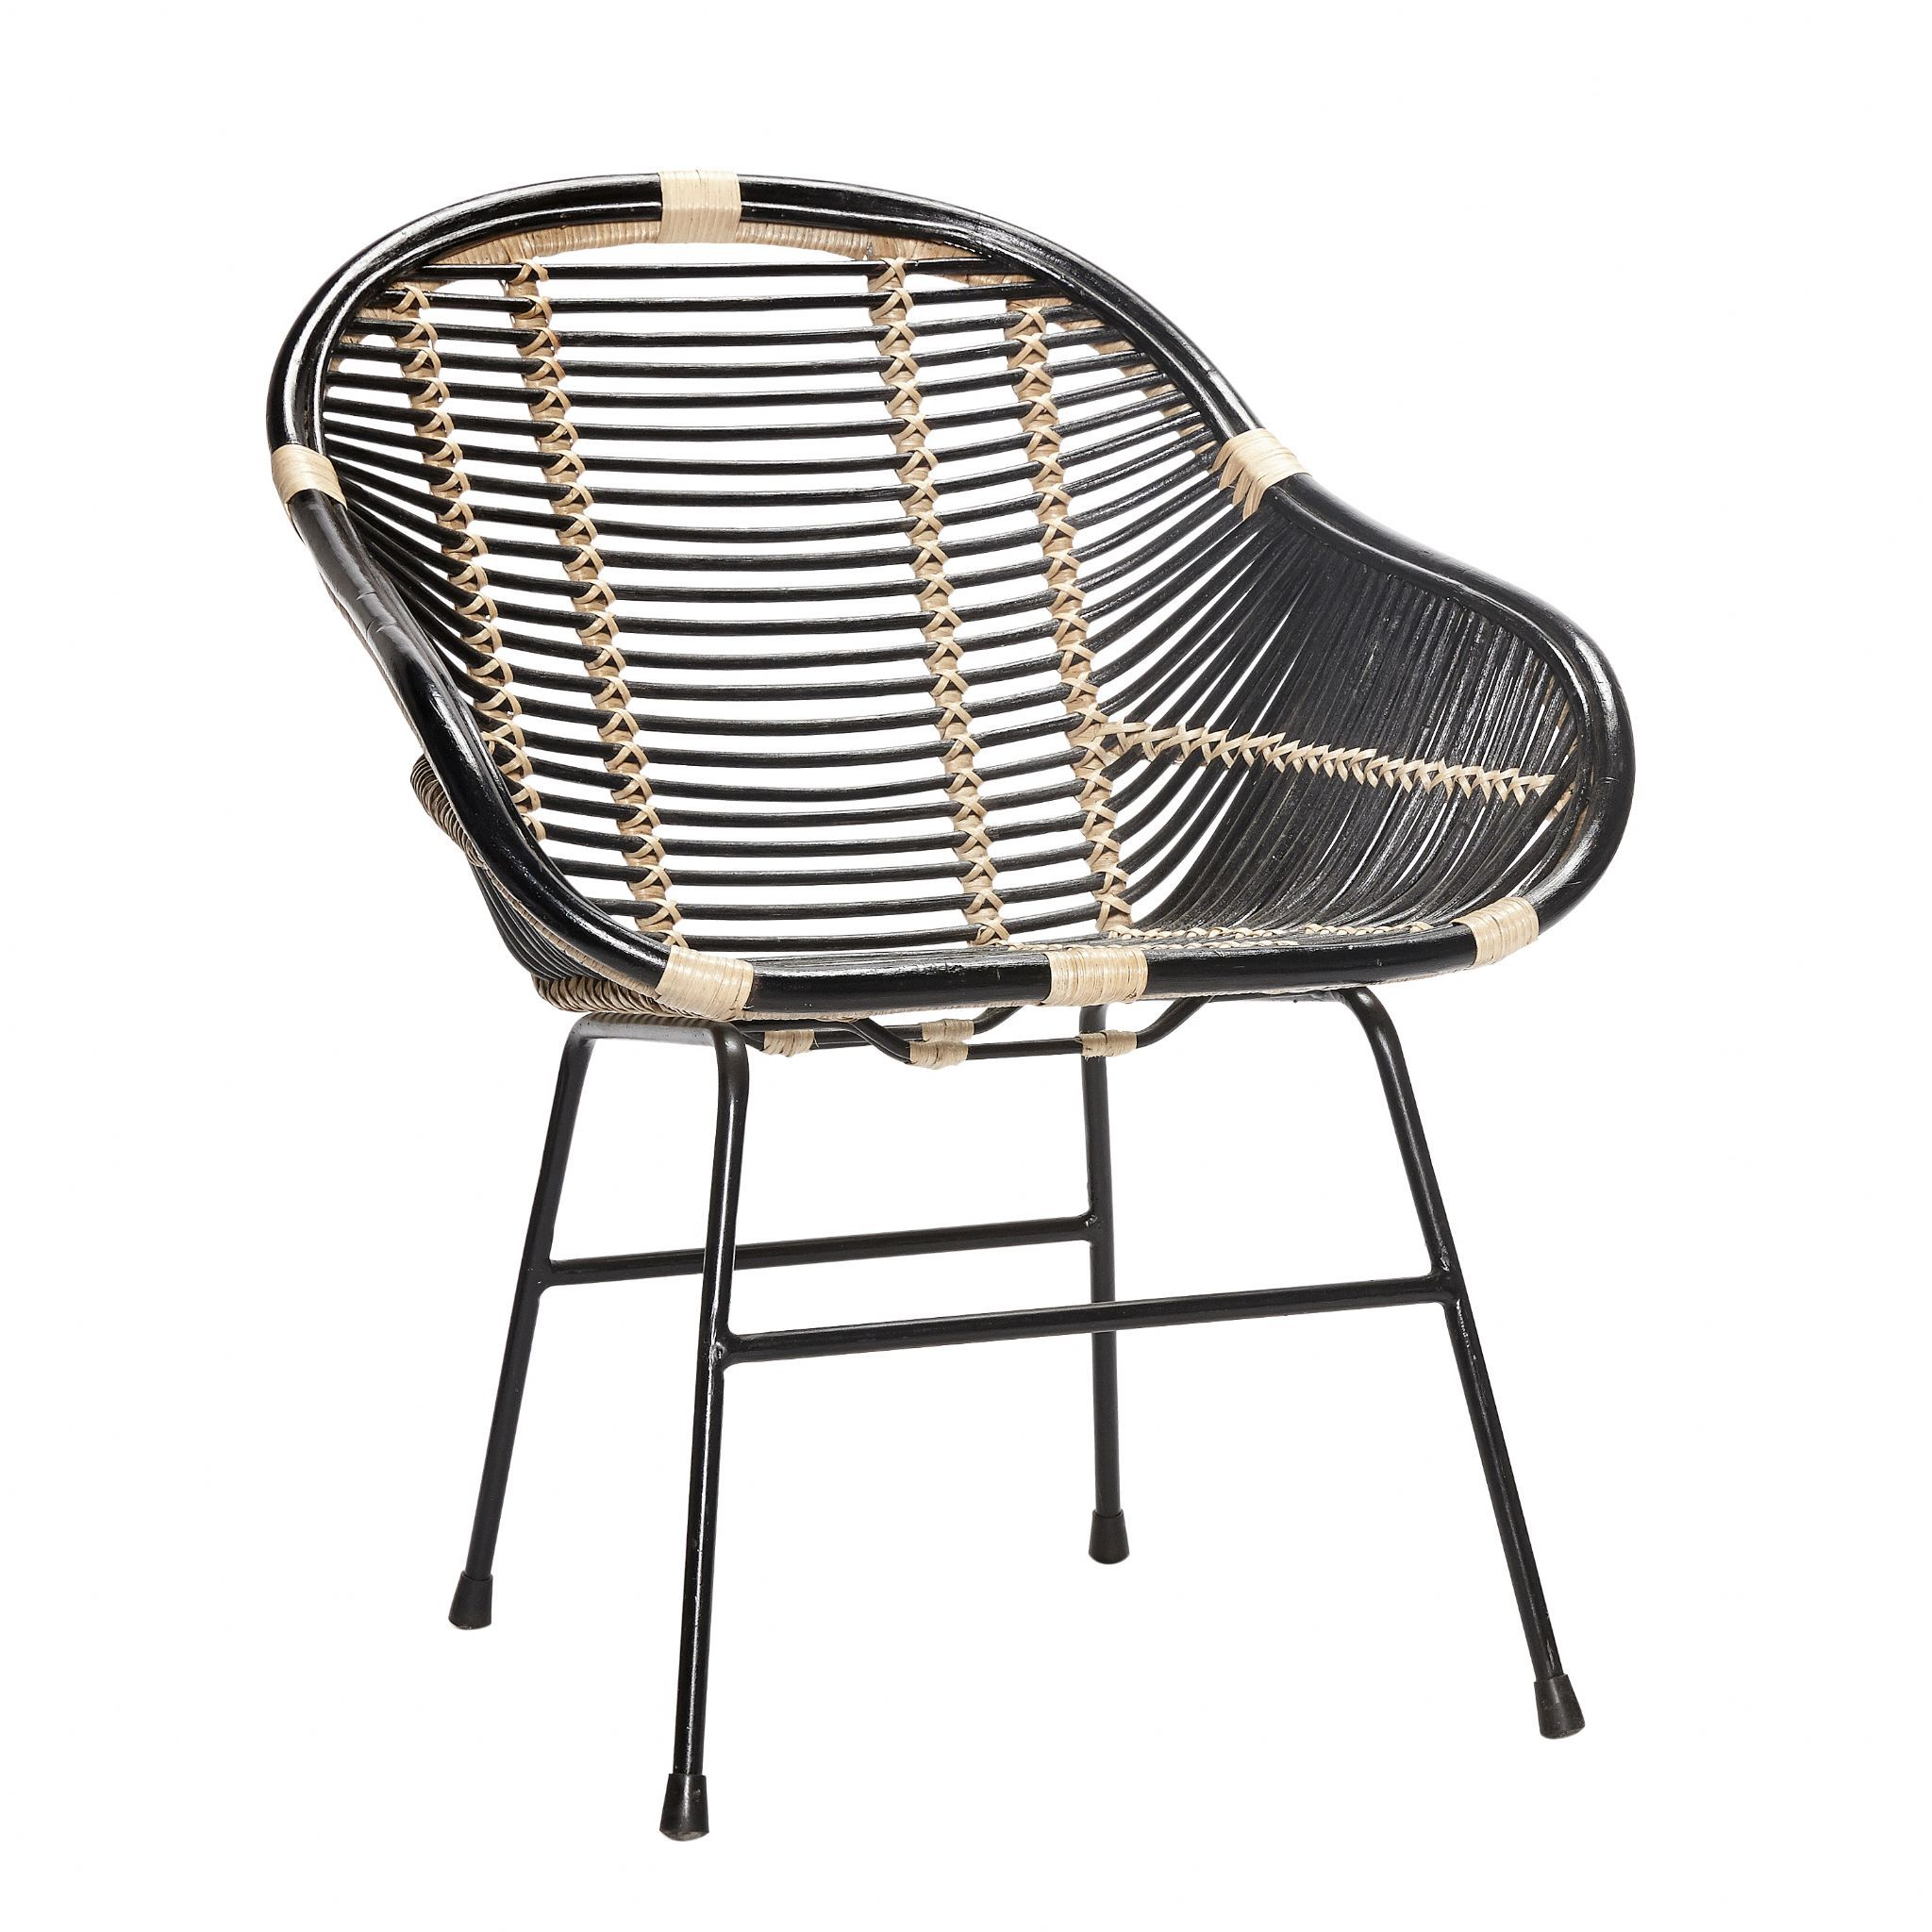 for rattan buy pontirattan by chair vittorio lounge sell chairs furniture gio ponti bonacina and easy